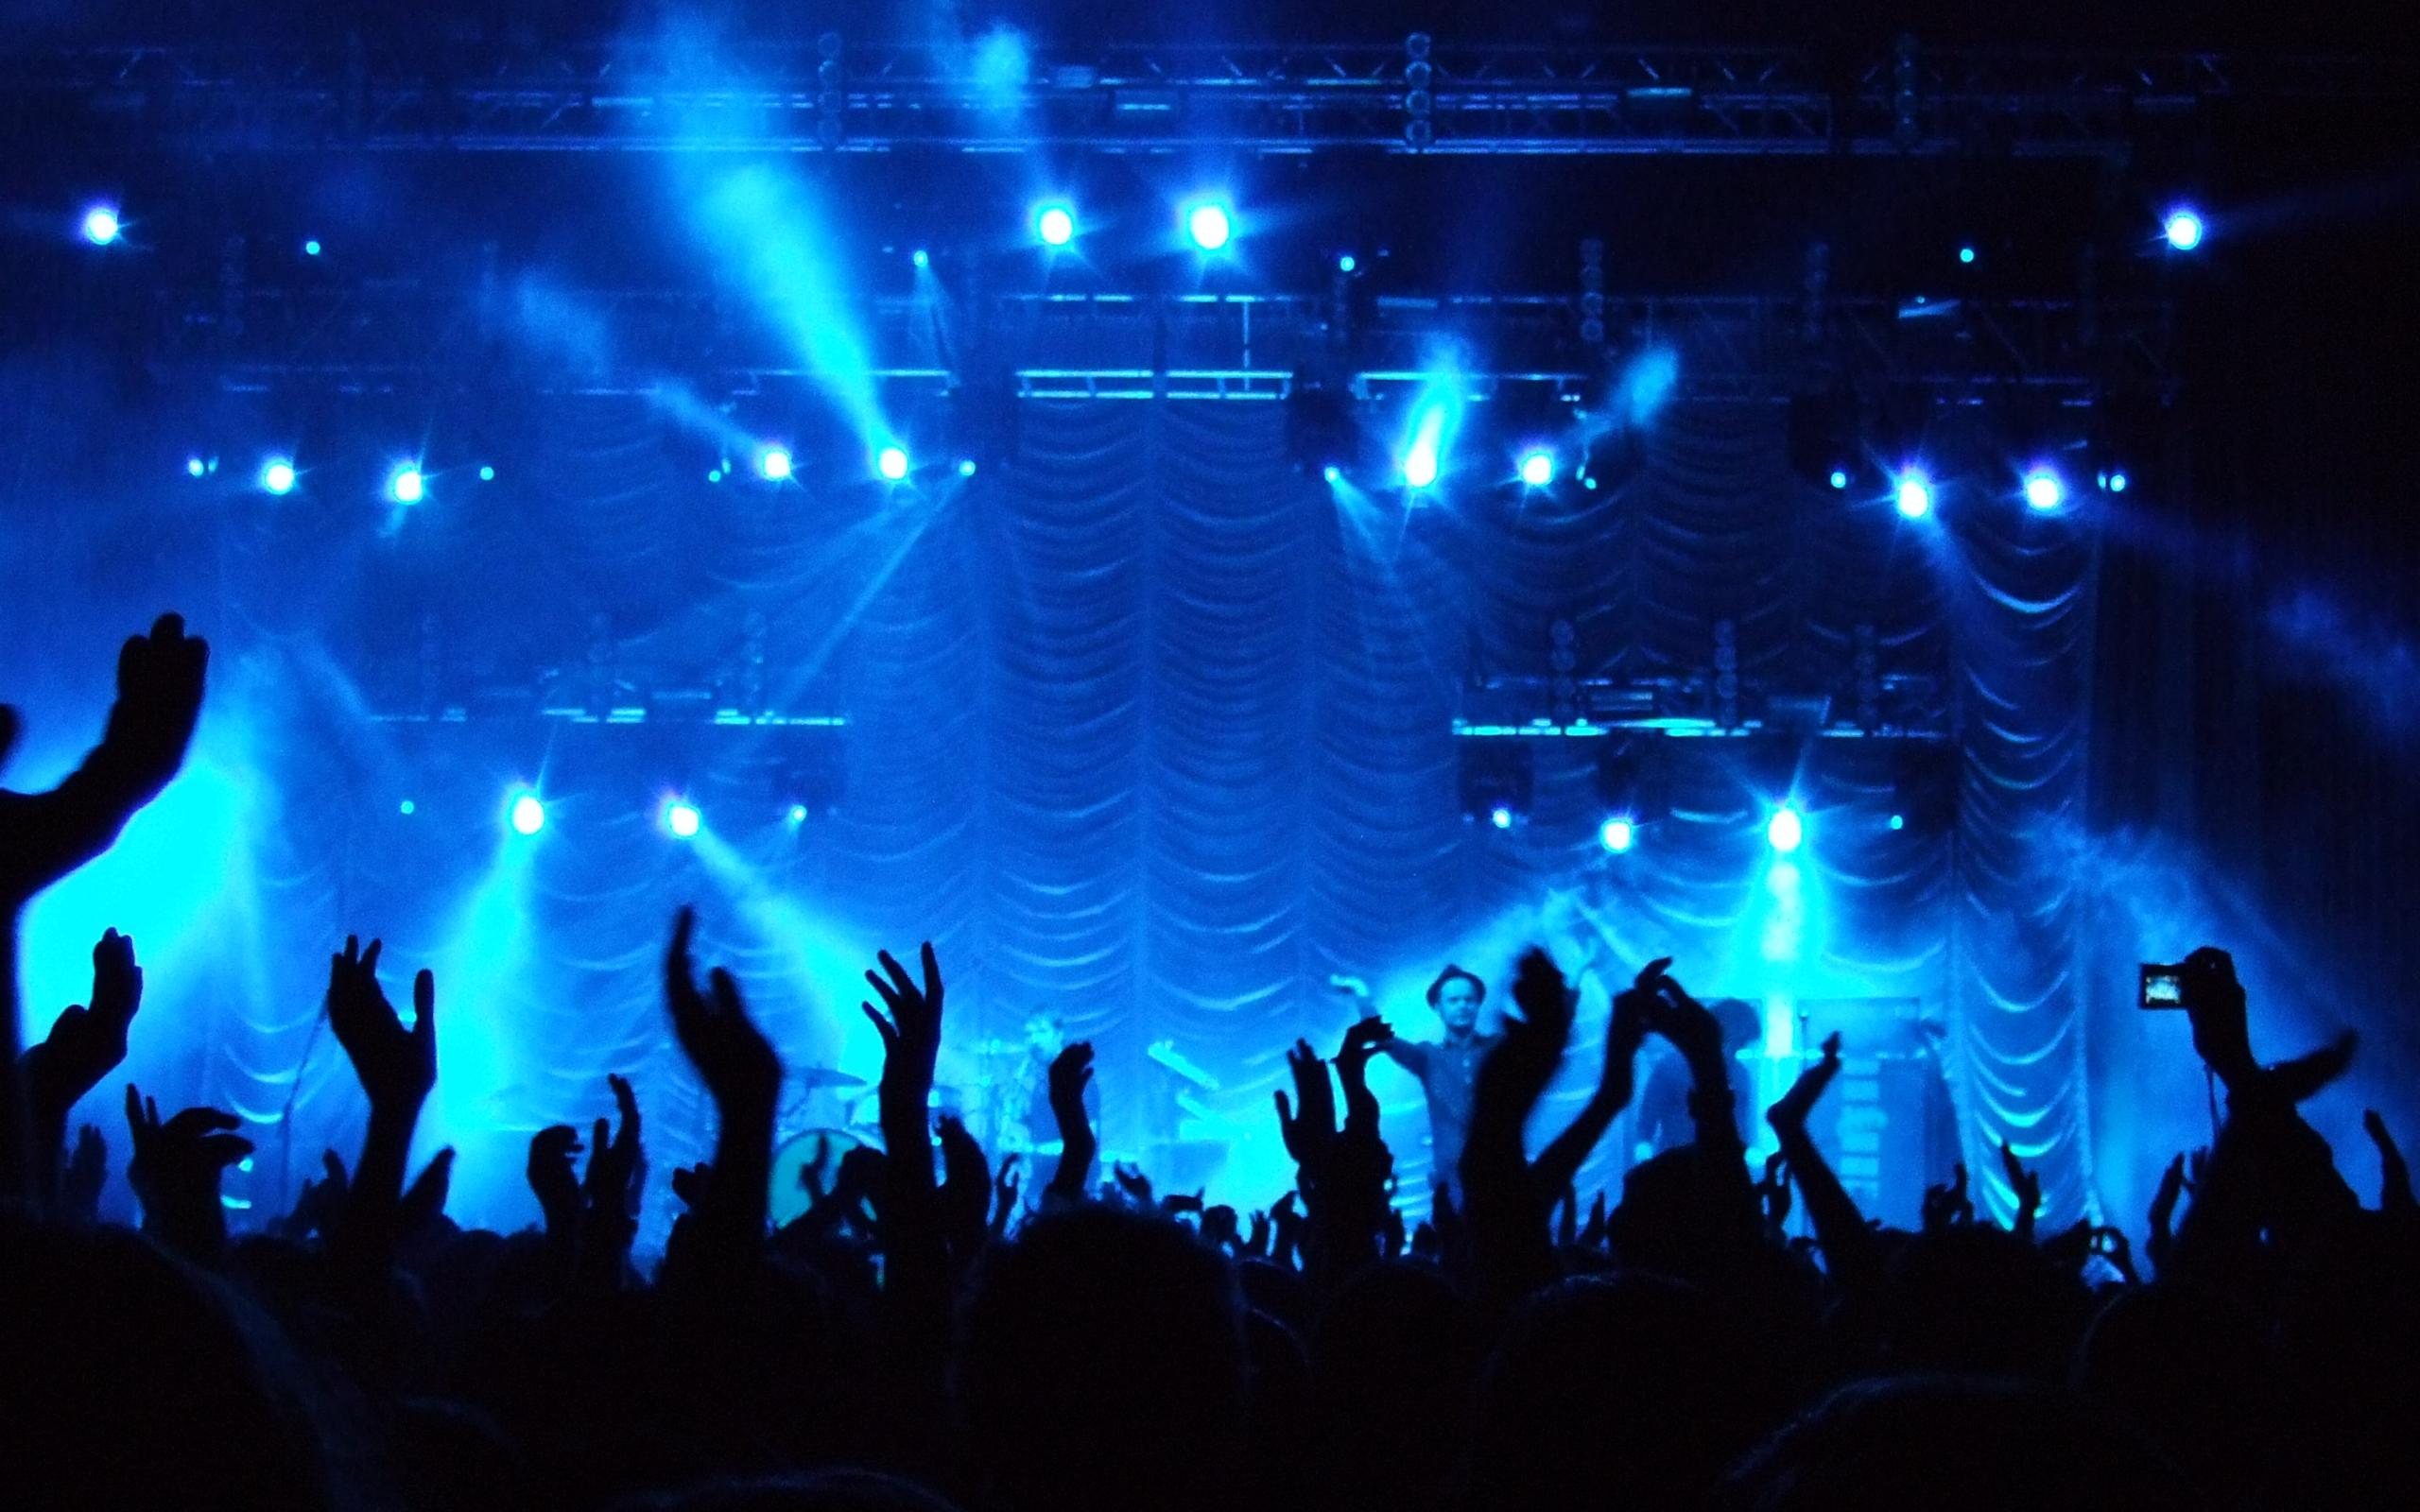 https://i1.wp.com/wvuafm.ua.edu/wp-content/uploads/2013/04/Concert1.jpg